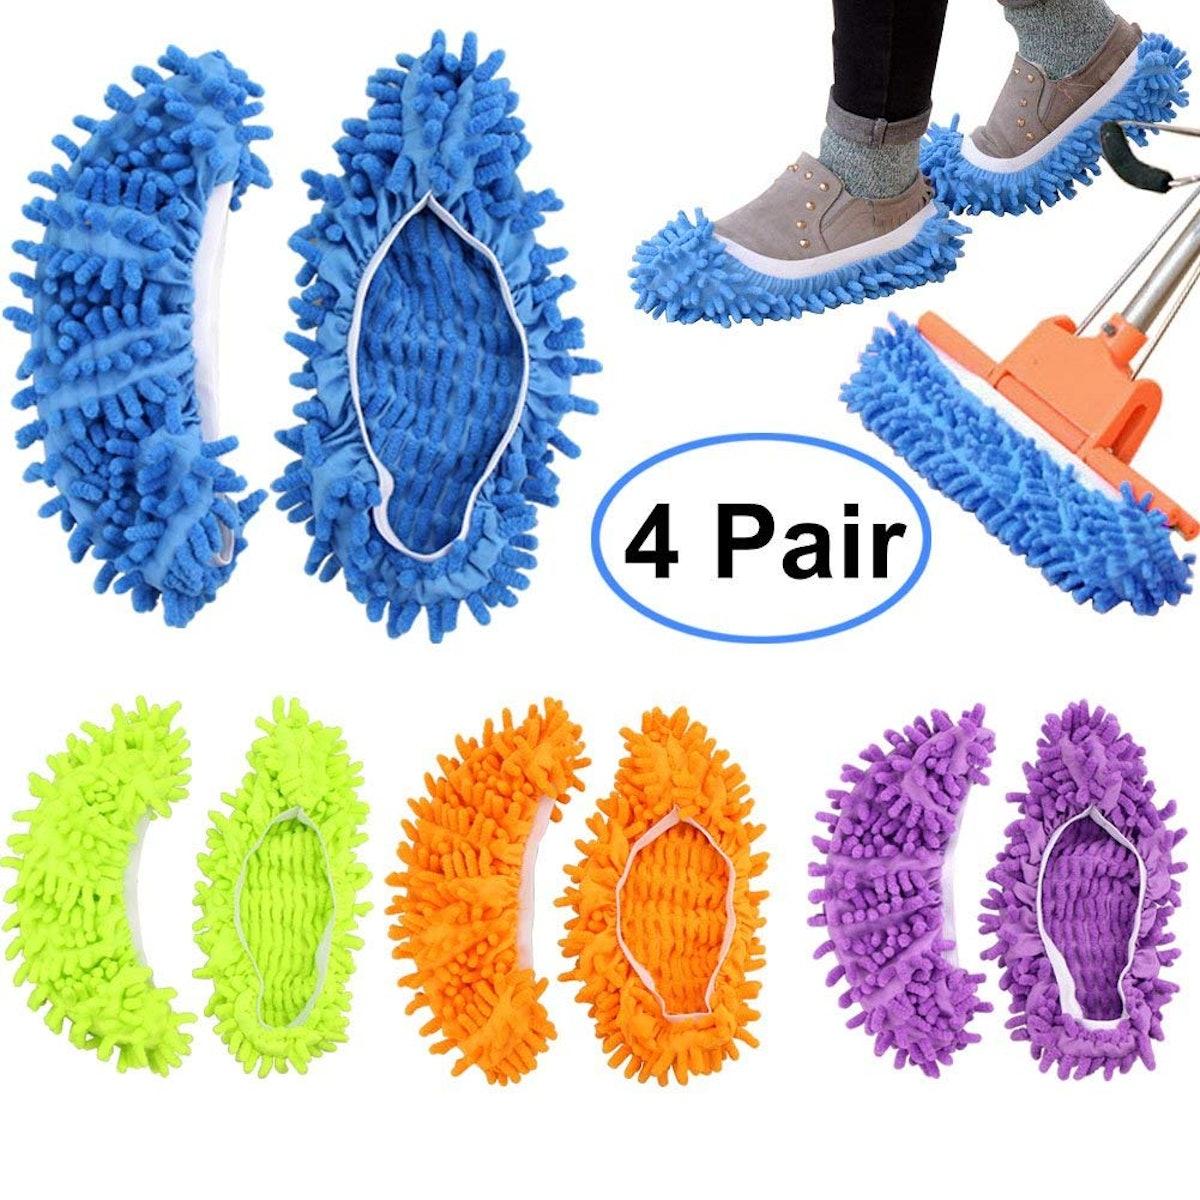 FEATHERHEAD Dust Mop Slippers